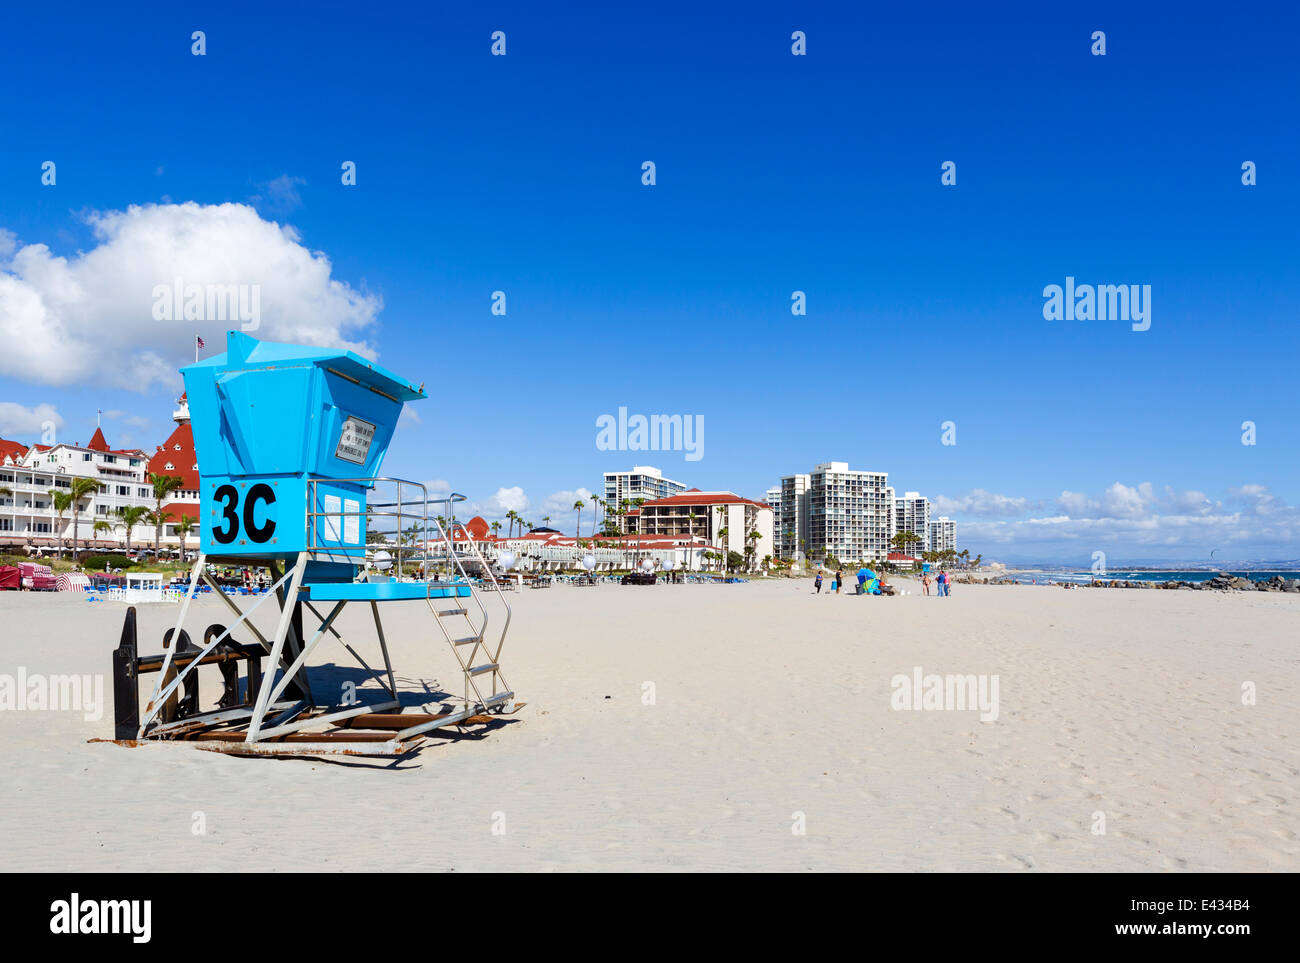 The beach in front of the Hotel del Coronado, Coronado Beach, San Diego, California, USA Stock Photo